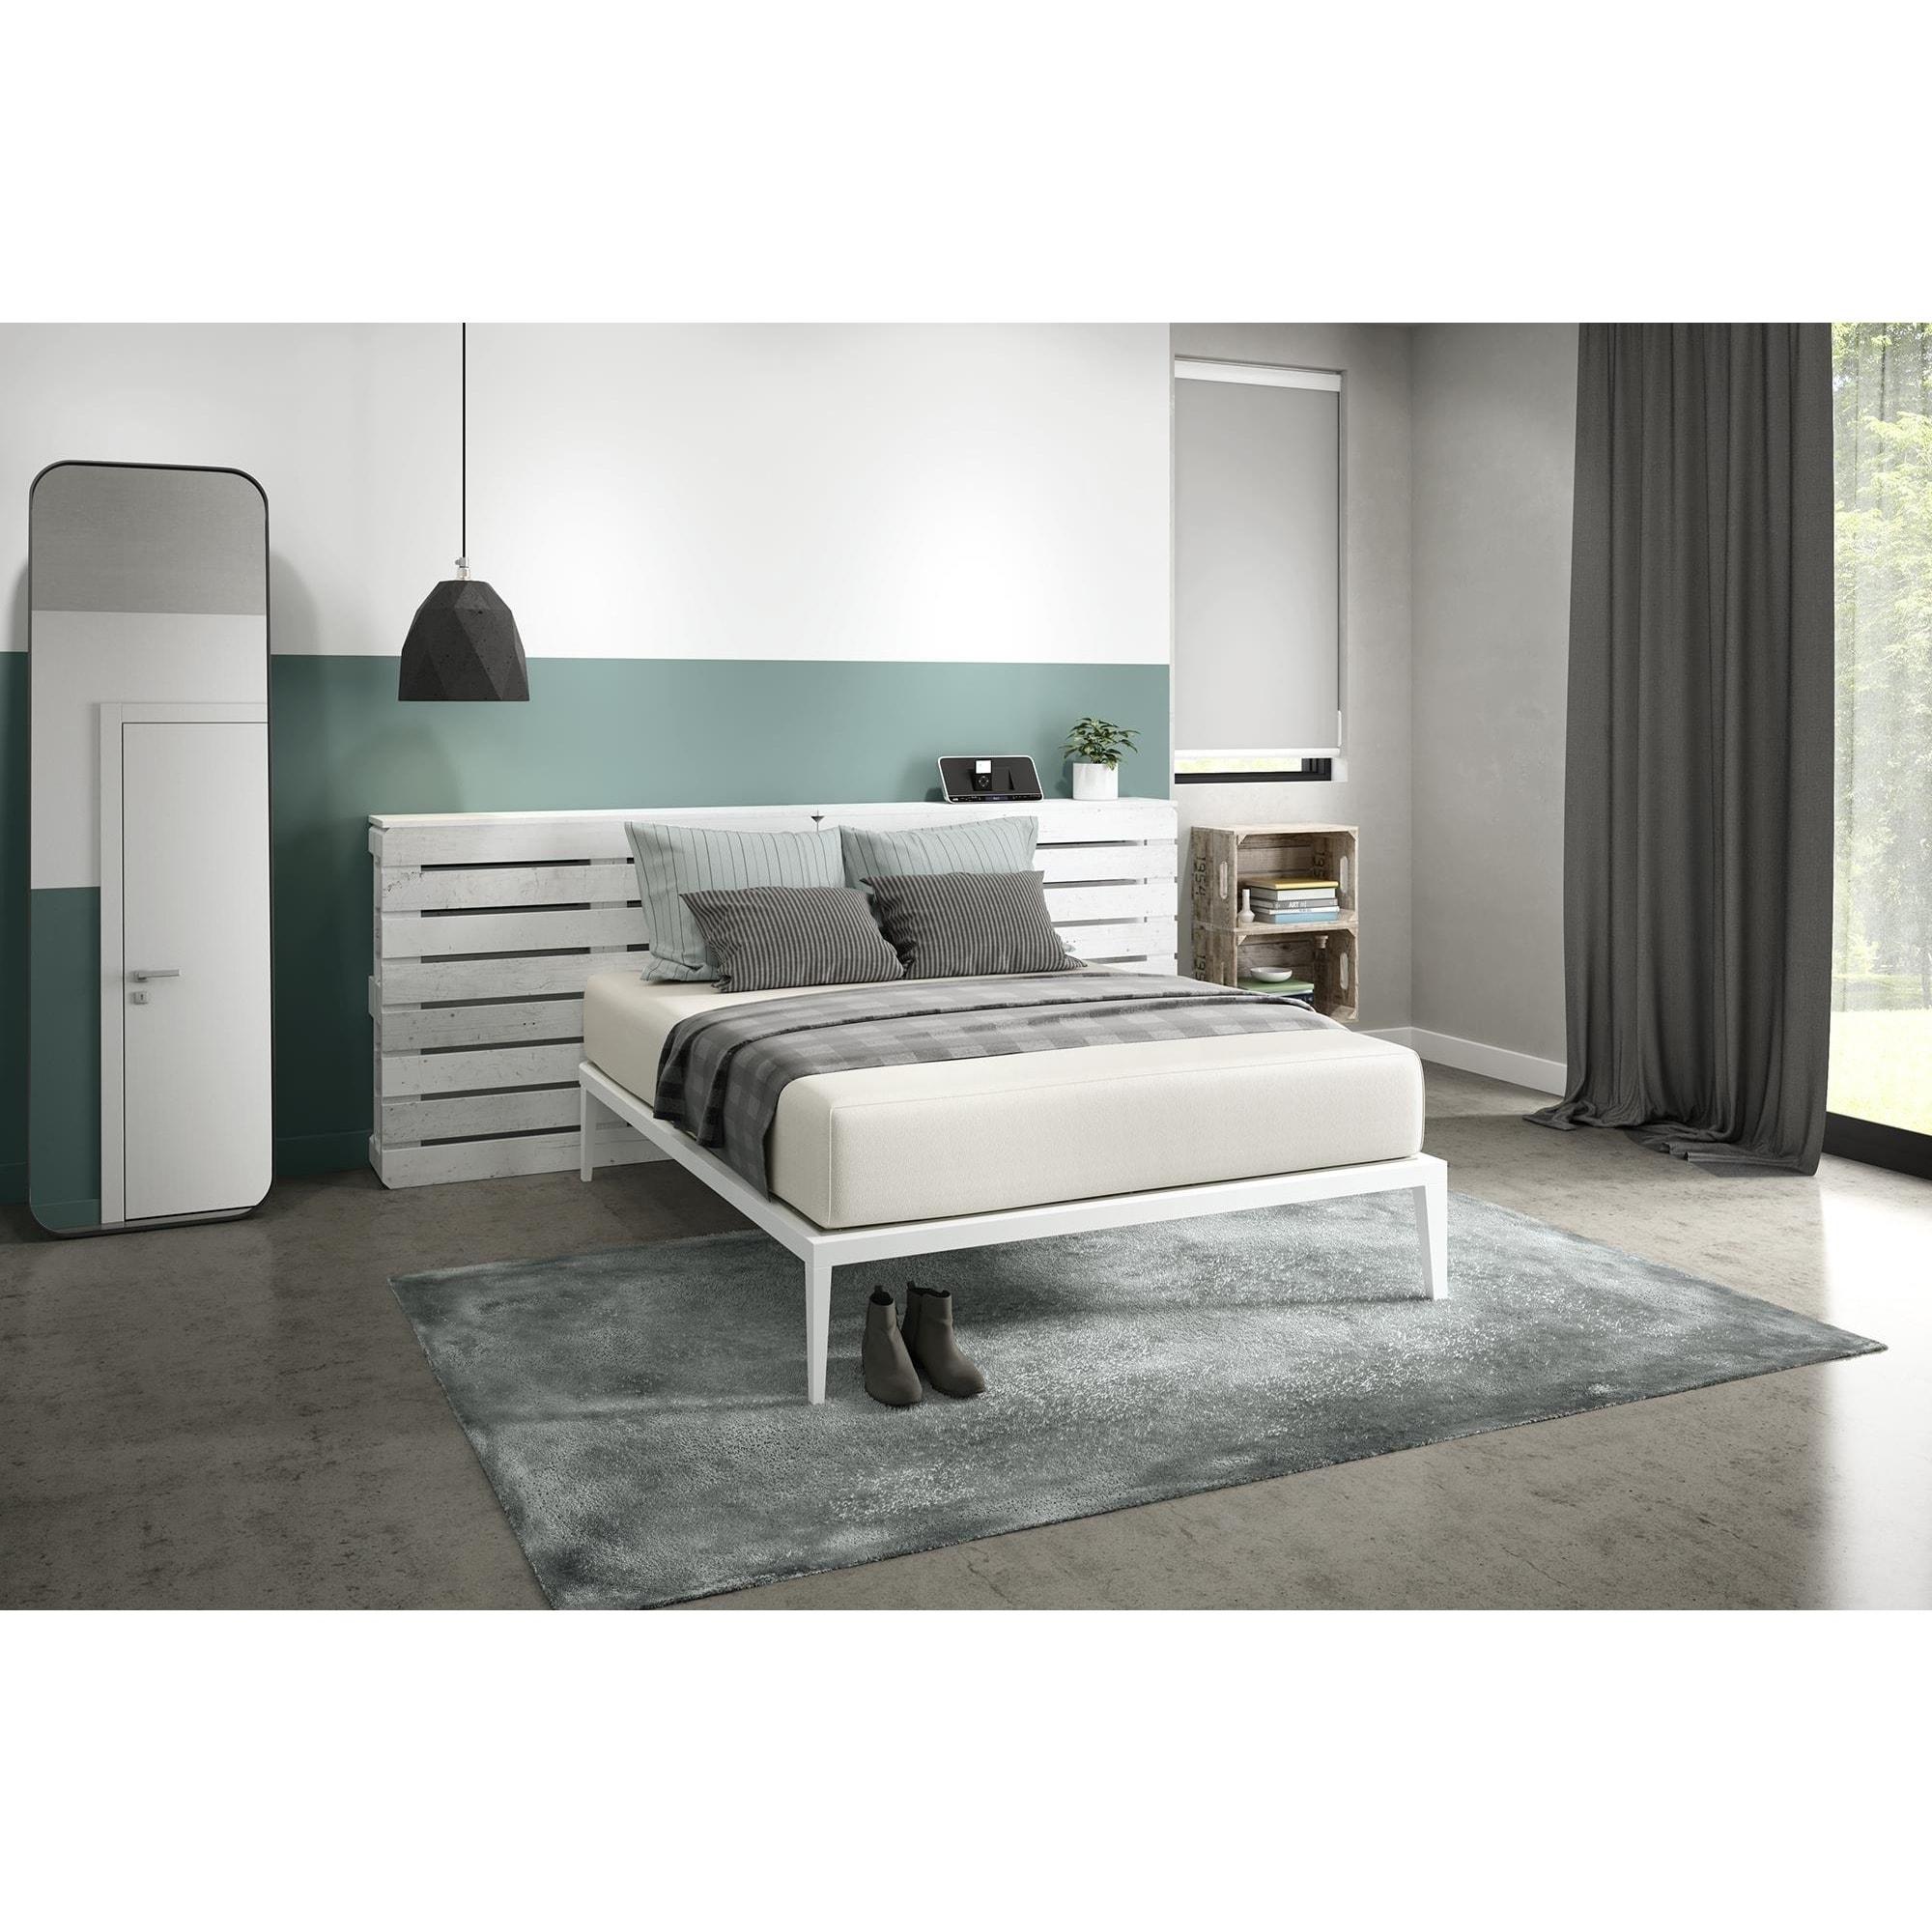 Shop Signature Sleep Tranquility 12 Inch Memory Foam Full Mattress